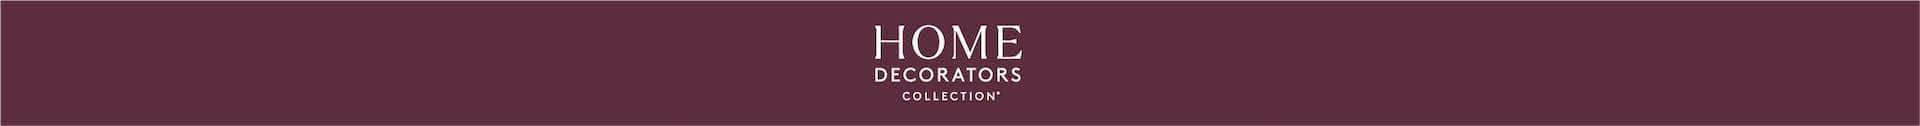 Home Decorators Collection